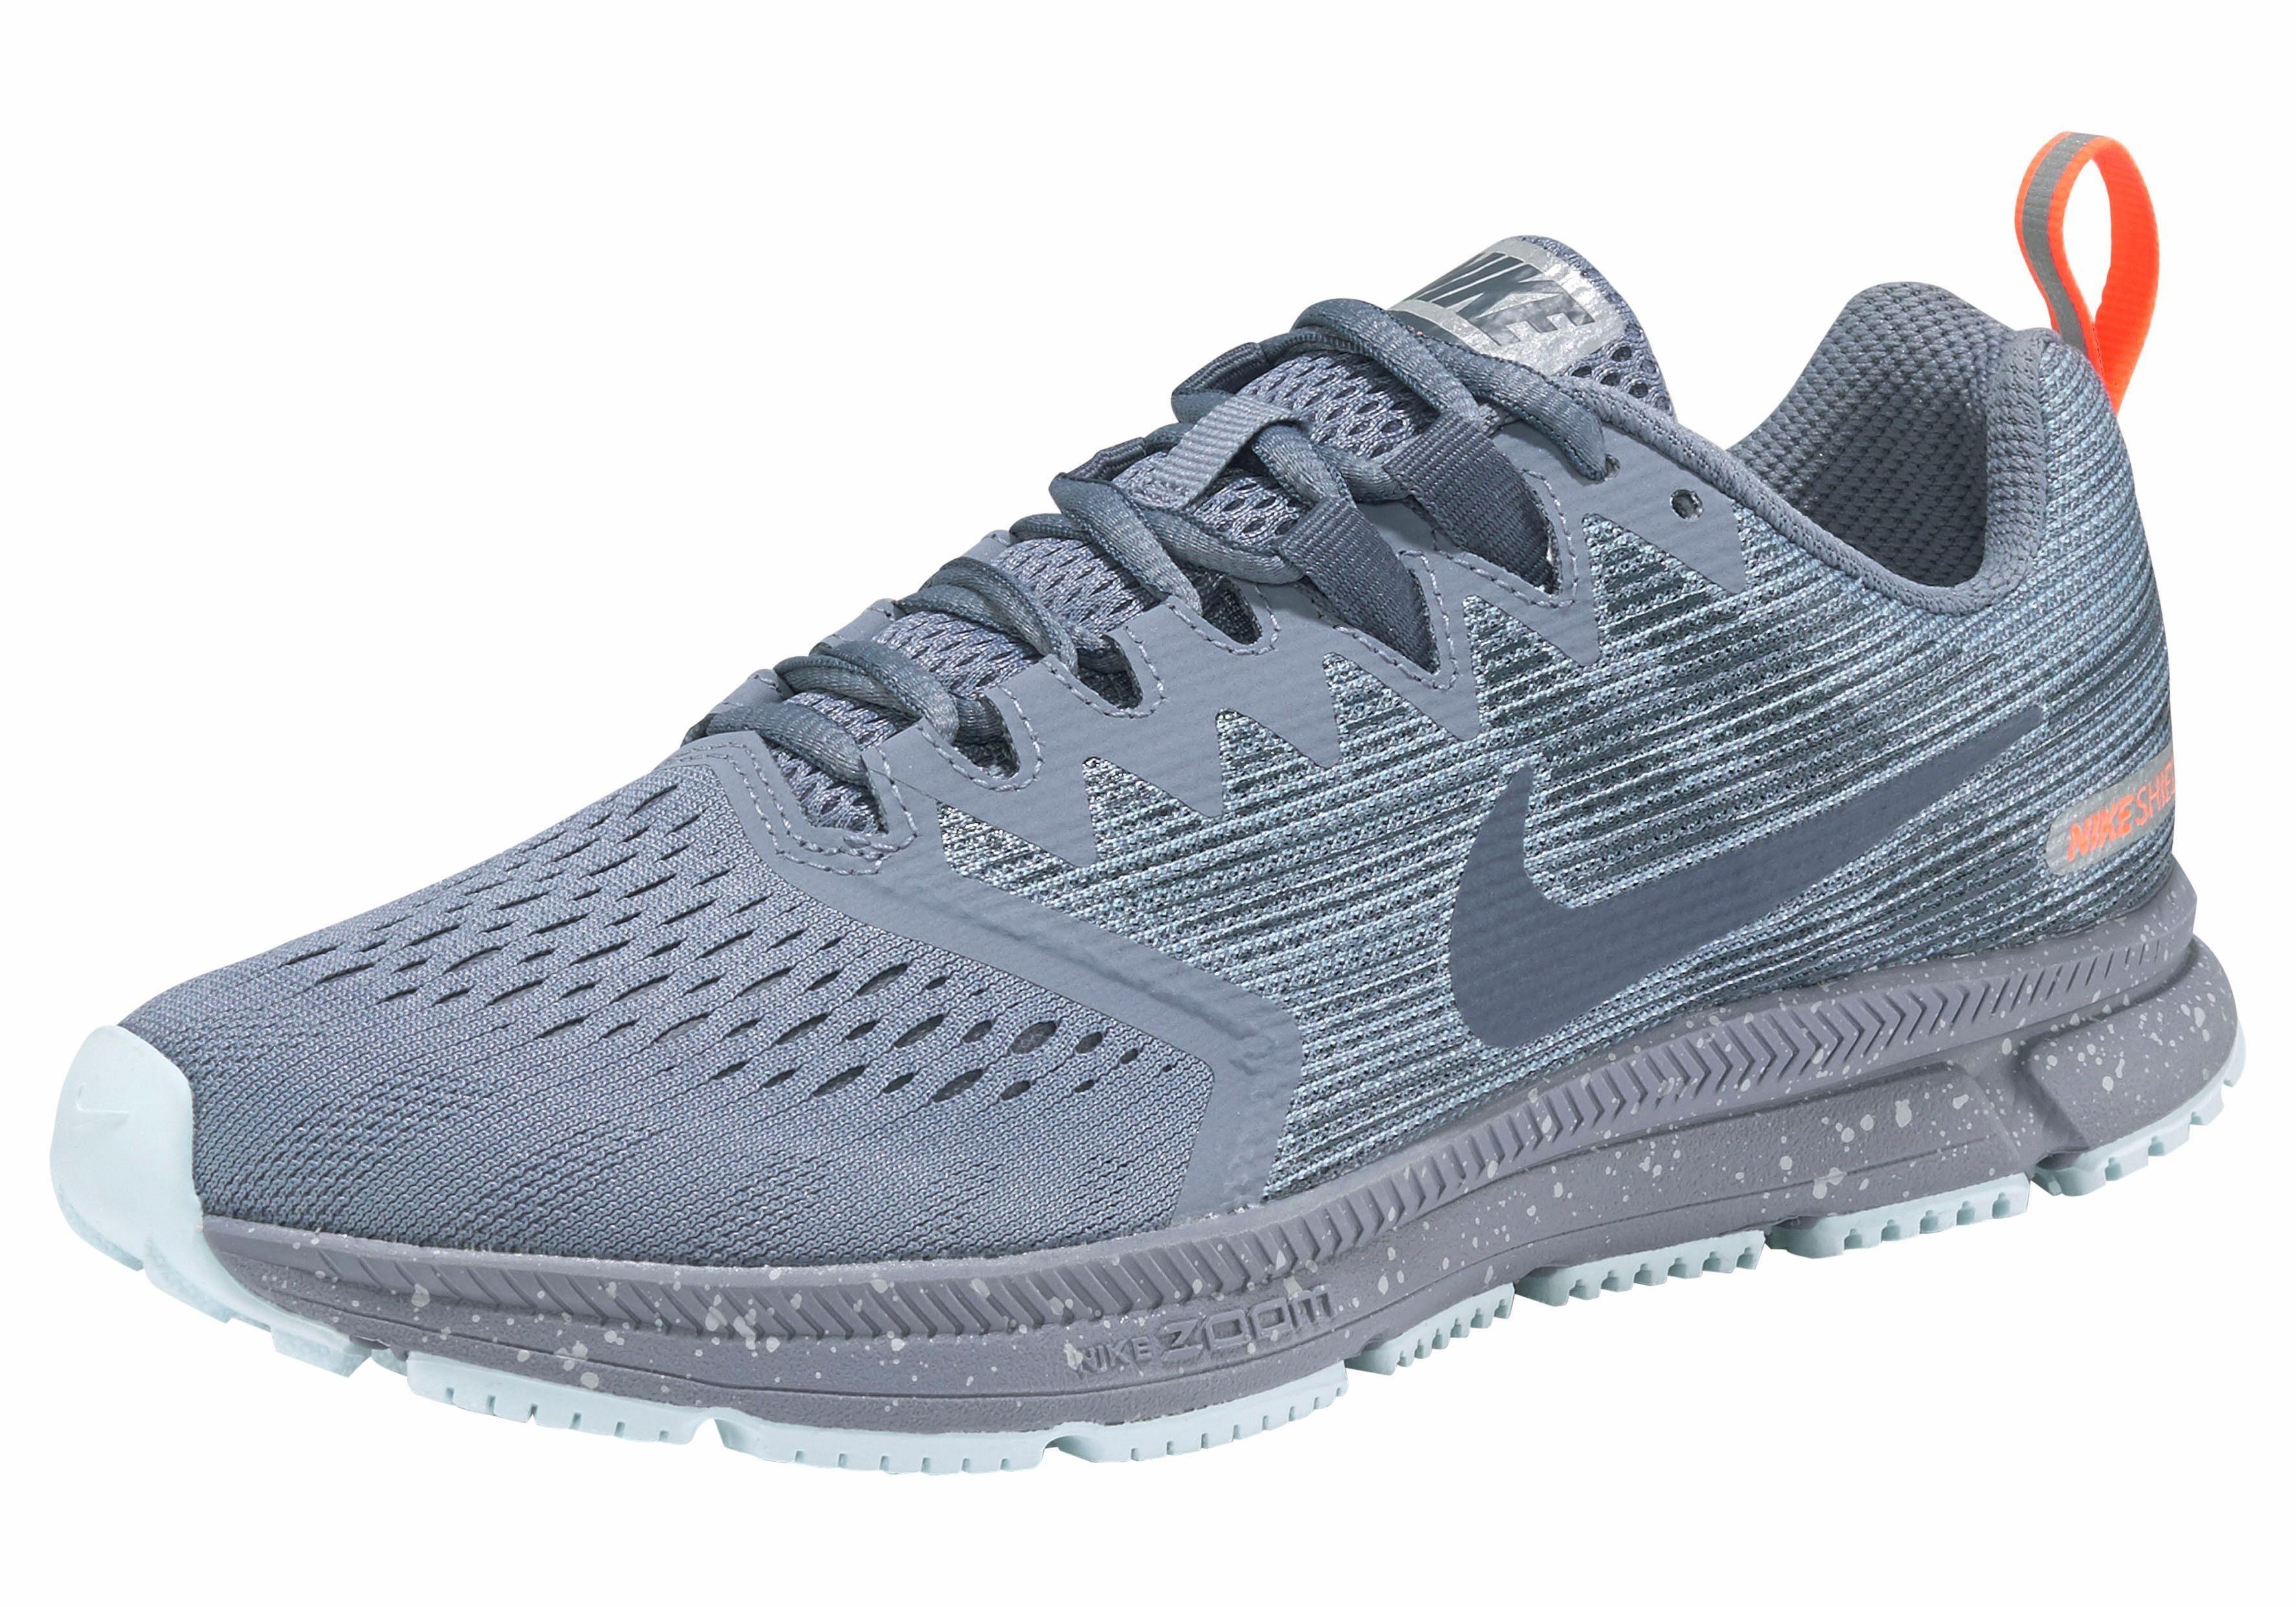 Nike Wmns Zoom Span 2 Shield Laufschuh kaufen  graublau